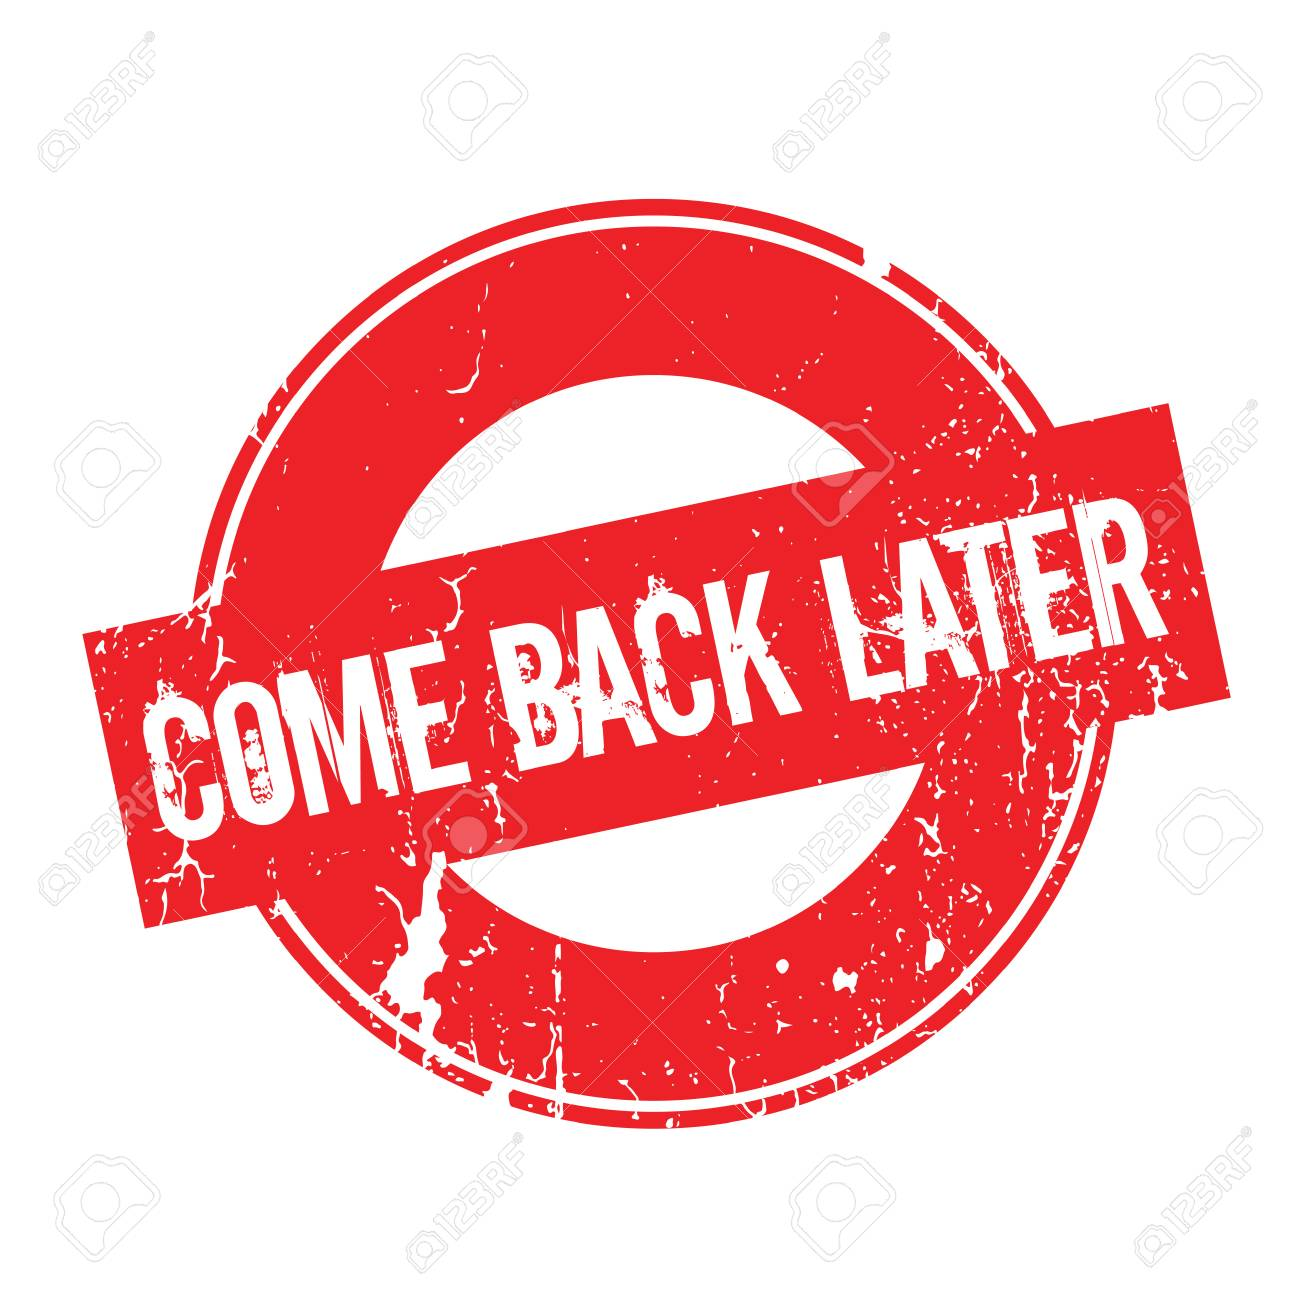 Resultado de imagen para Come back later